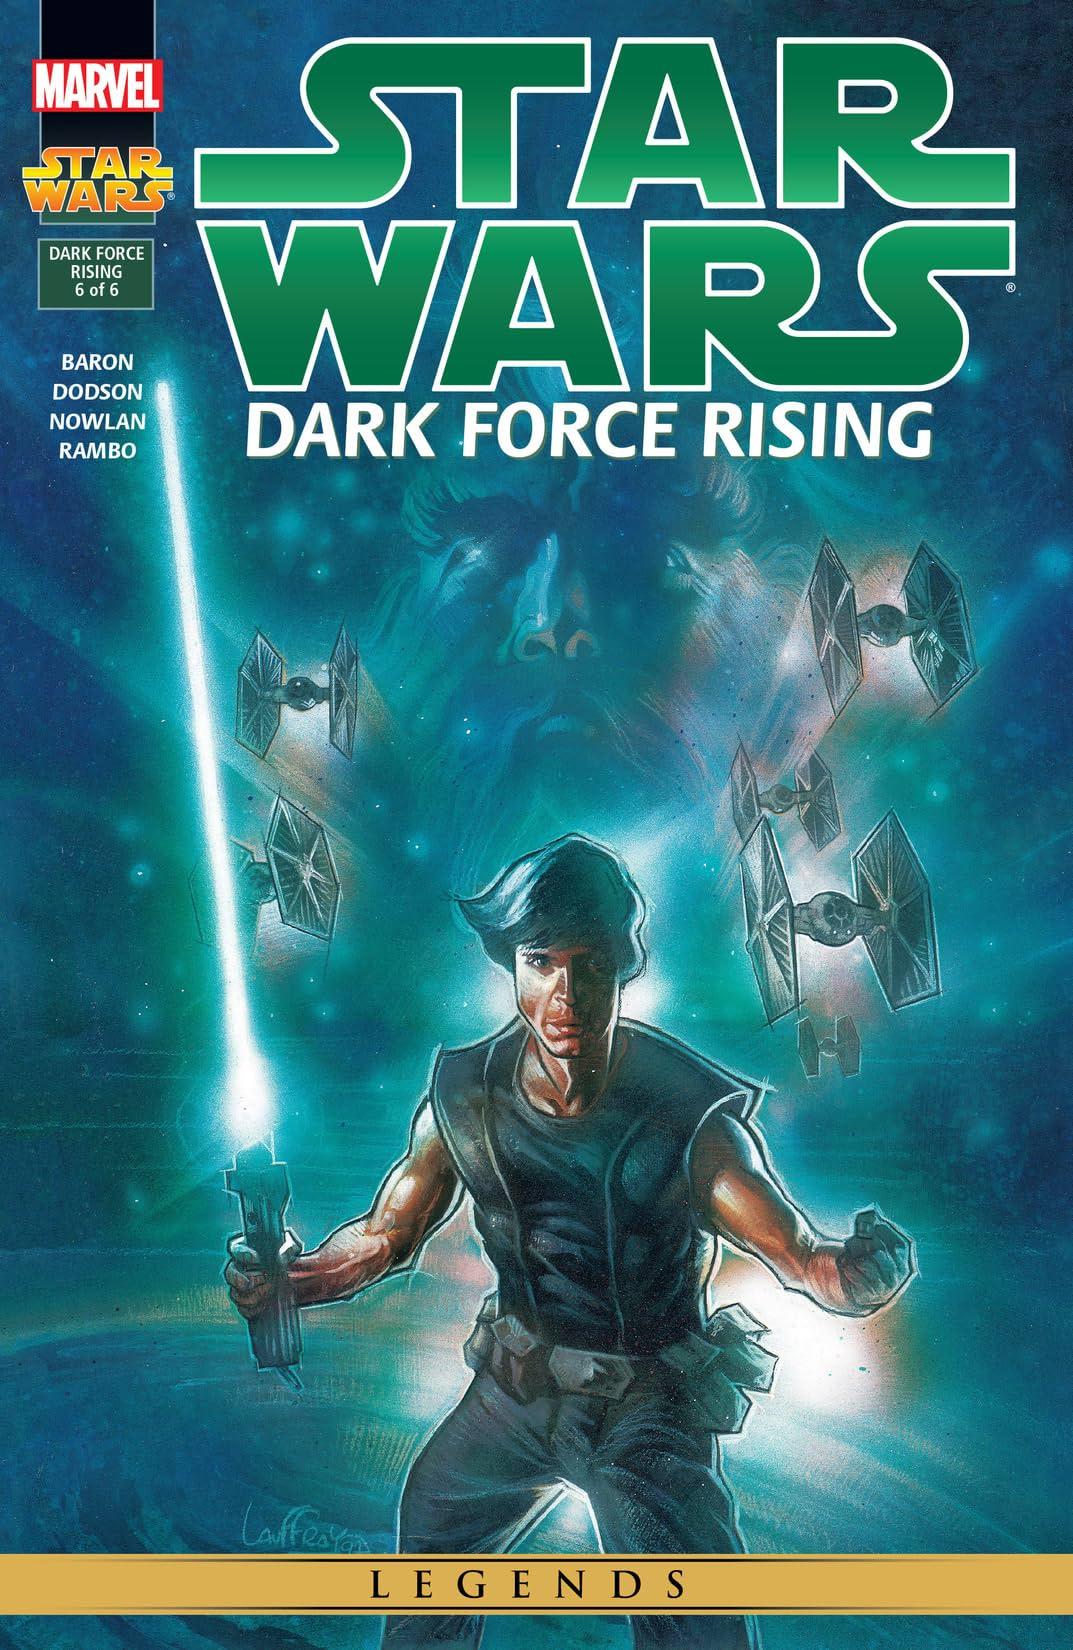 Star Wars: Dark Force Rising (1997) #6 (of 6)